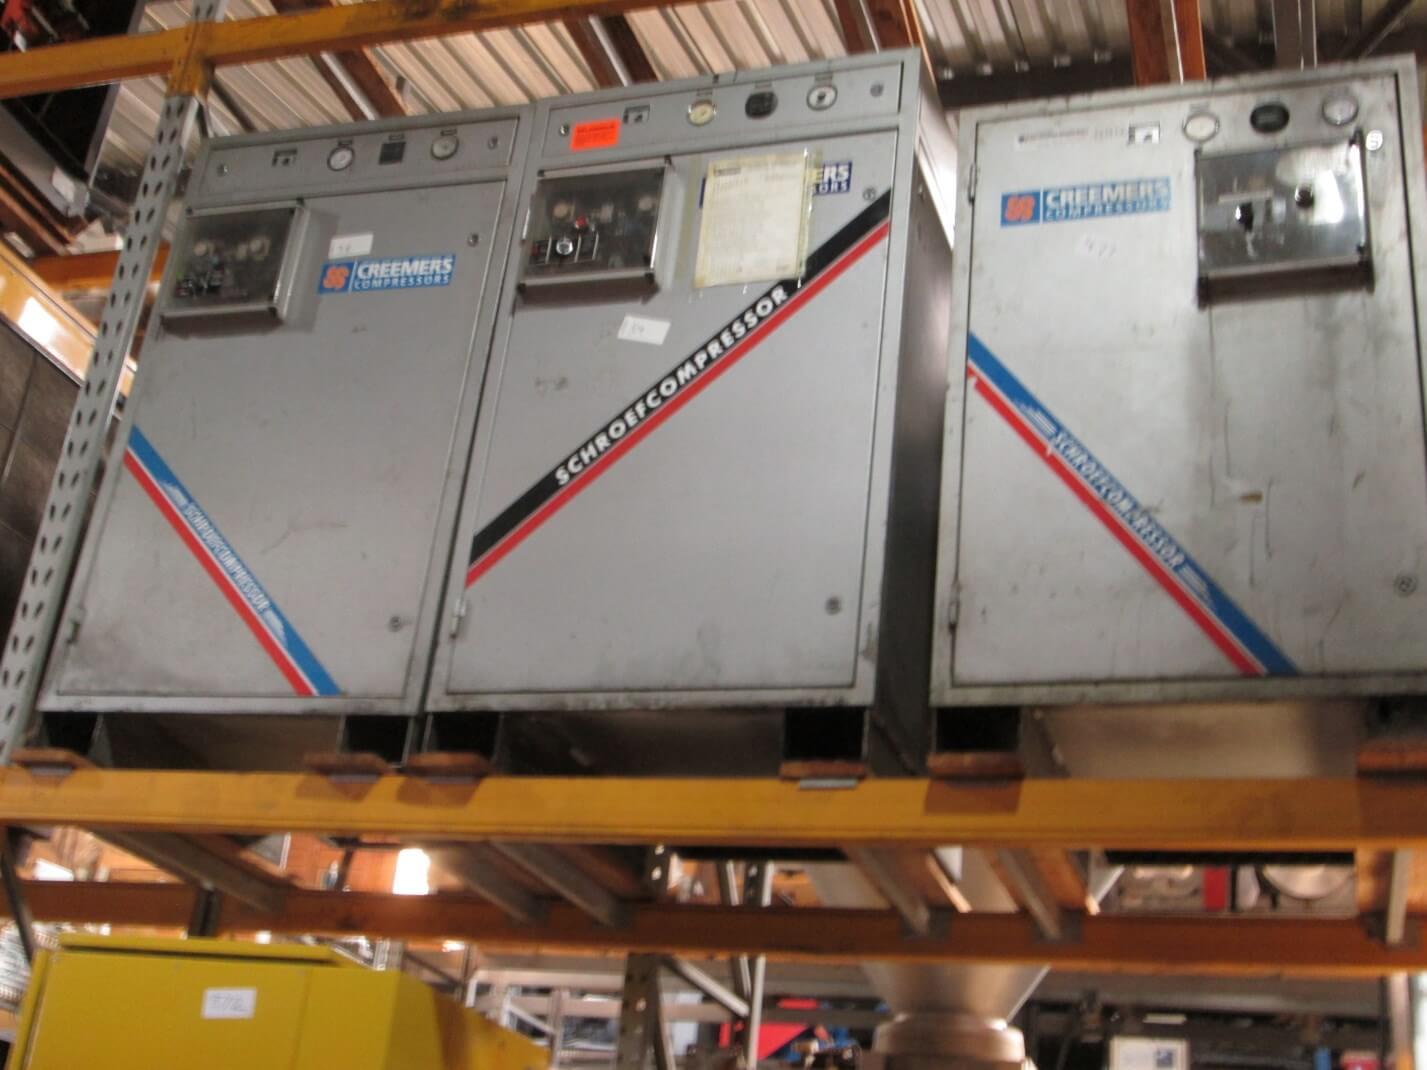 13  CREEMERS, Screw Compressor, RCC18 5, 18 5kW, 103 cfm, 8